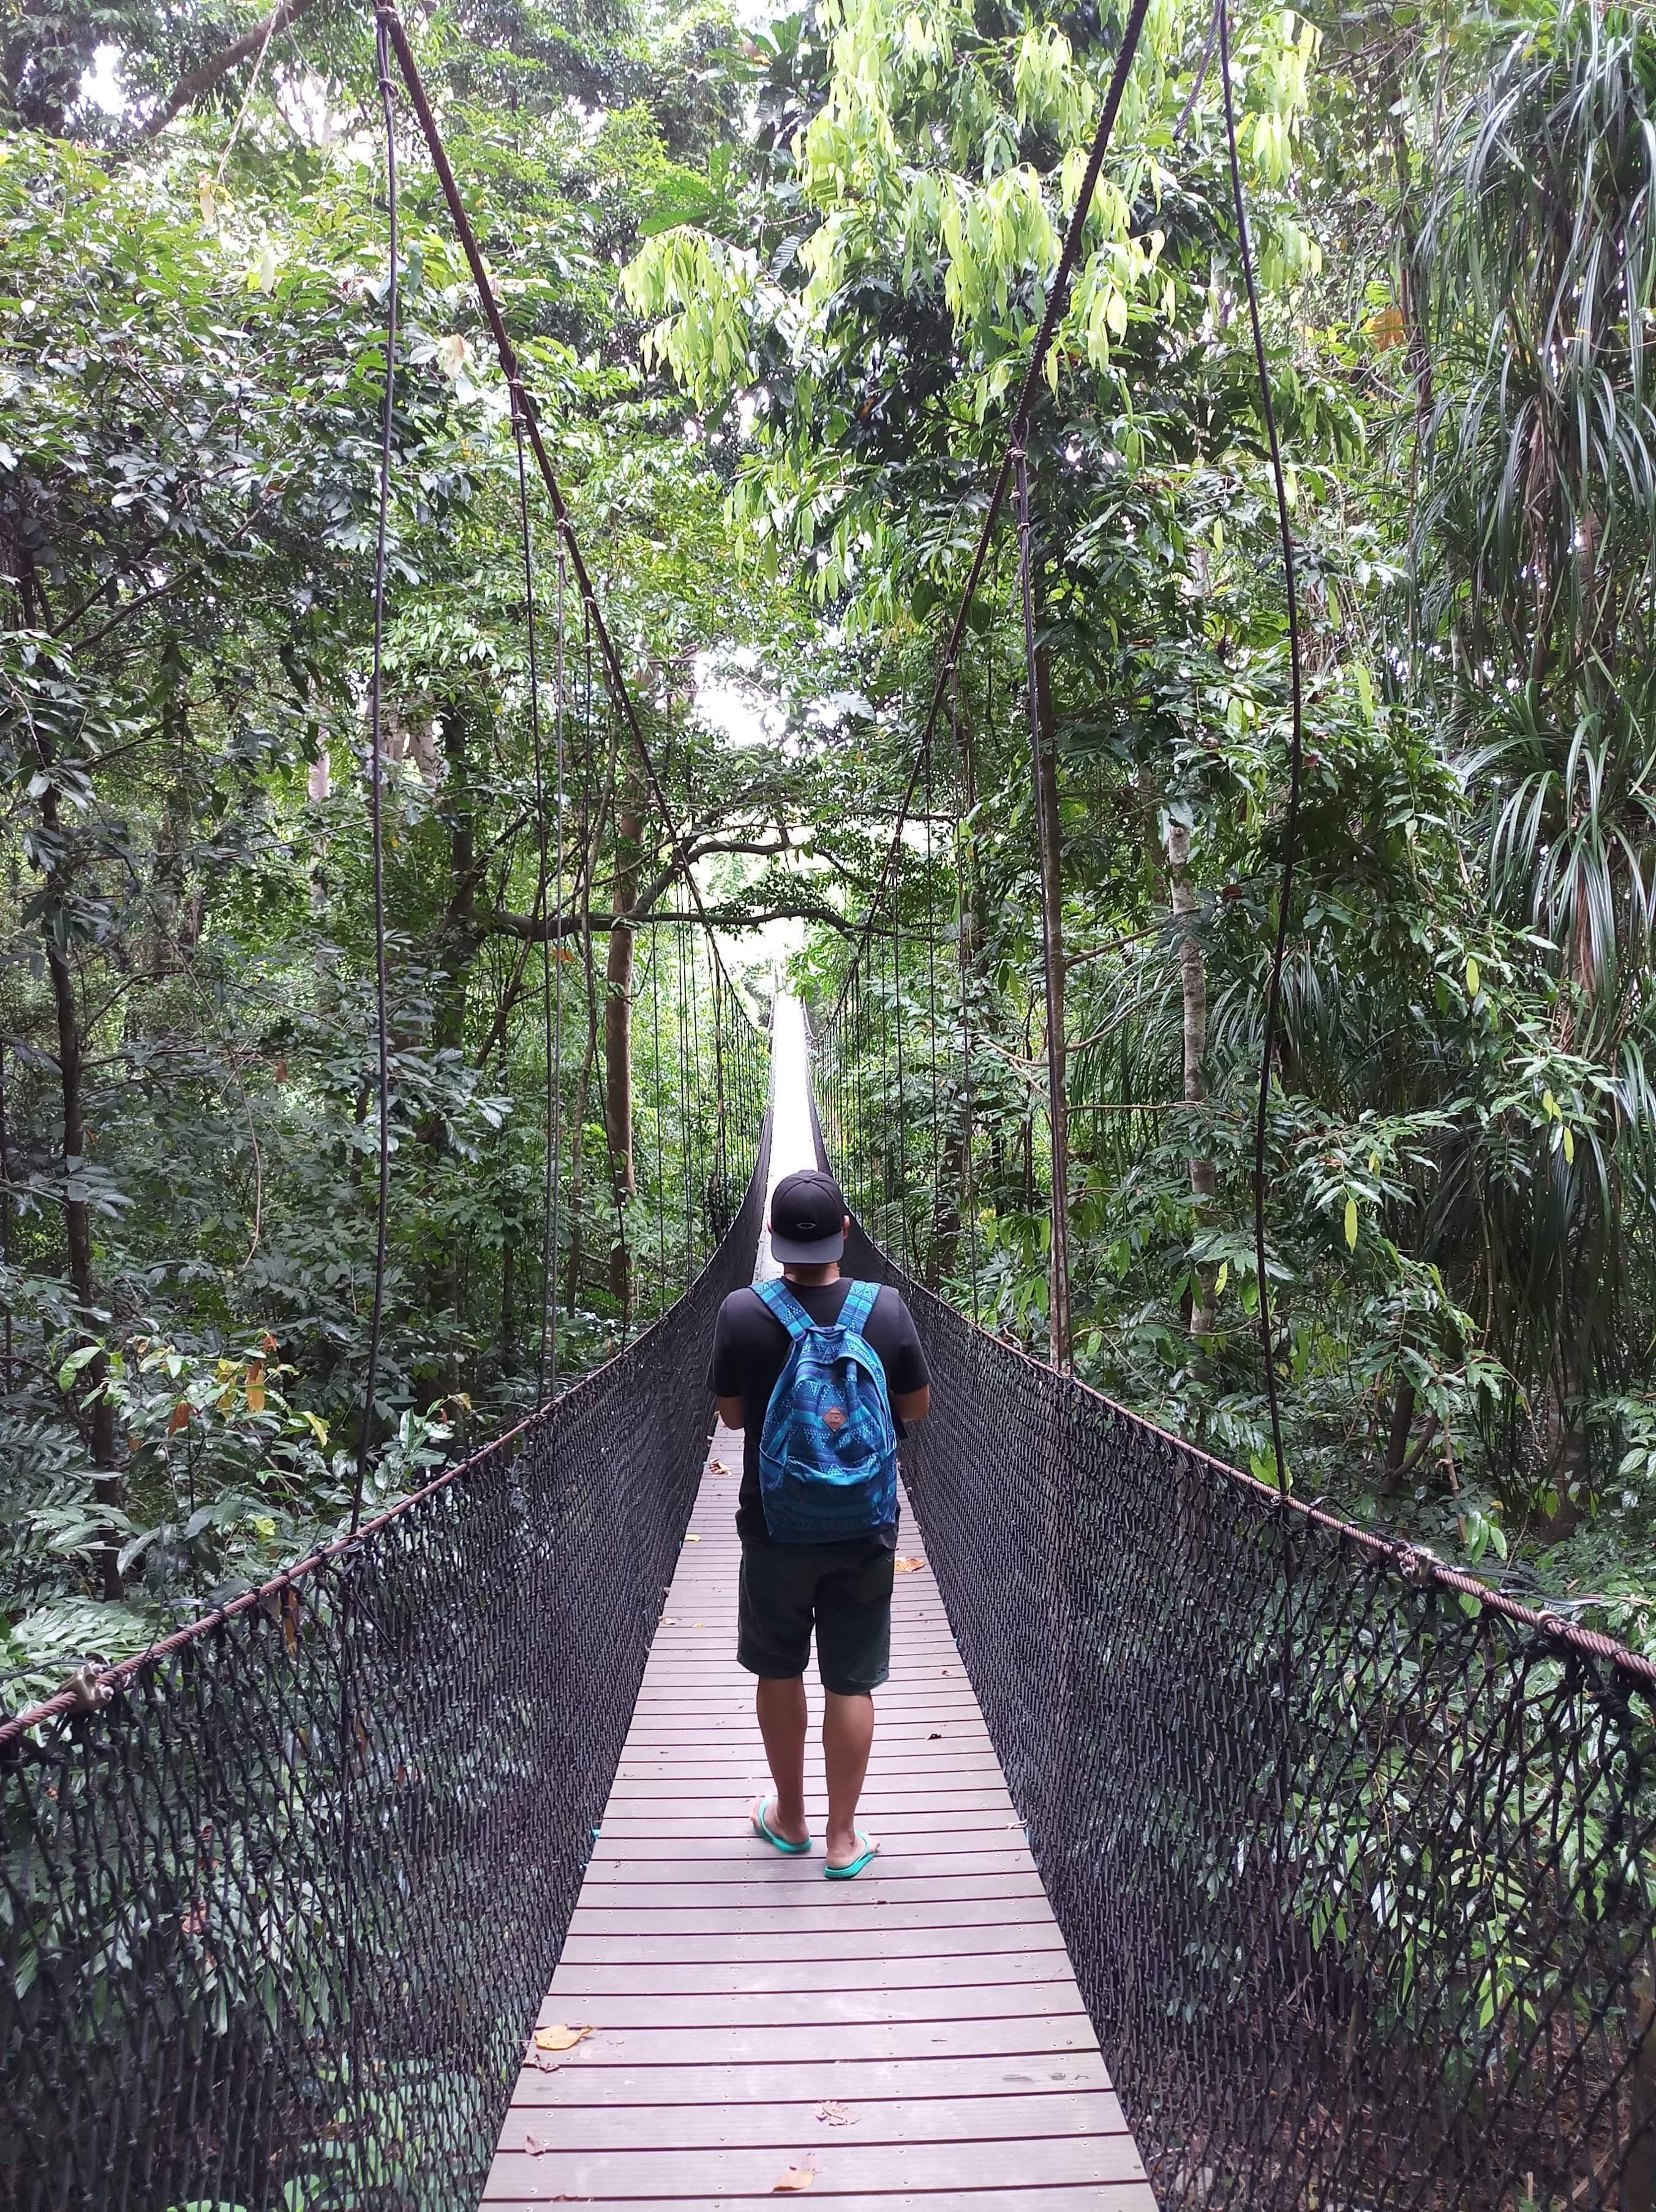 Man Walking on Hanging Bridge in Forest